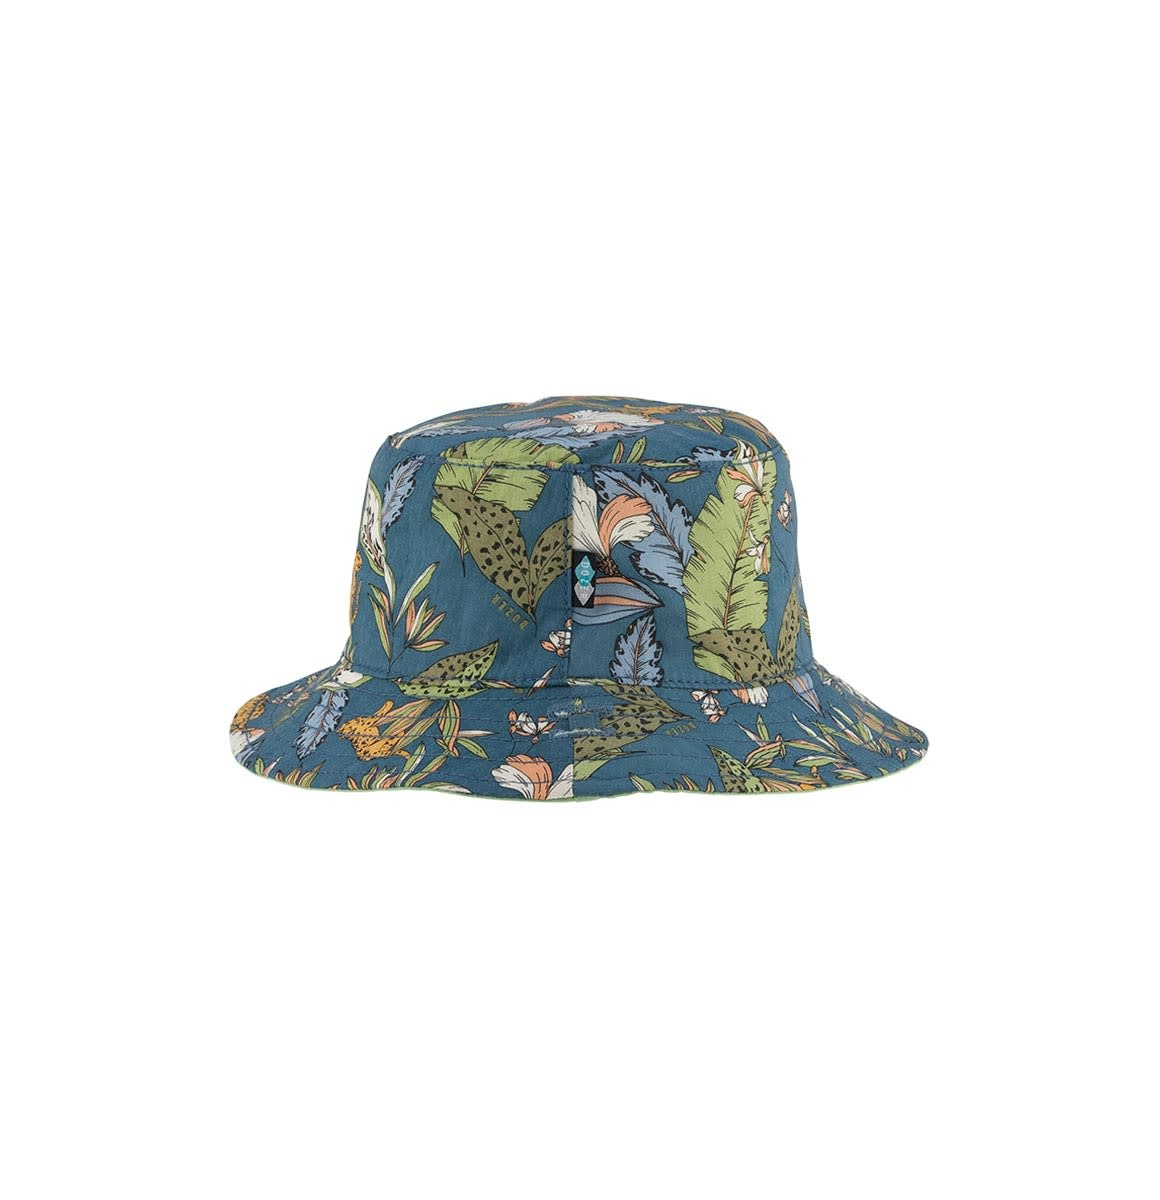 Millymook and Dozer Baby Boys Bucket Sun Hat - Maximus/Slate